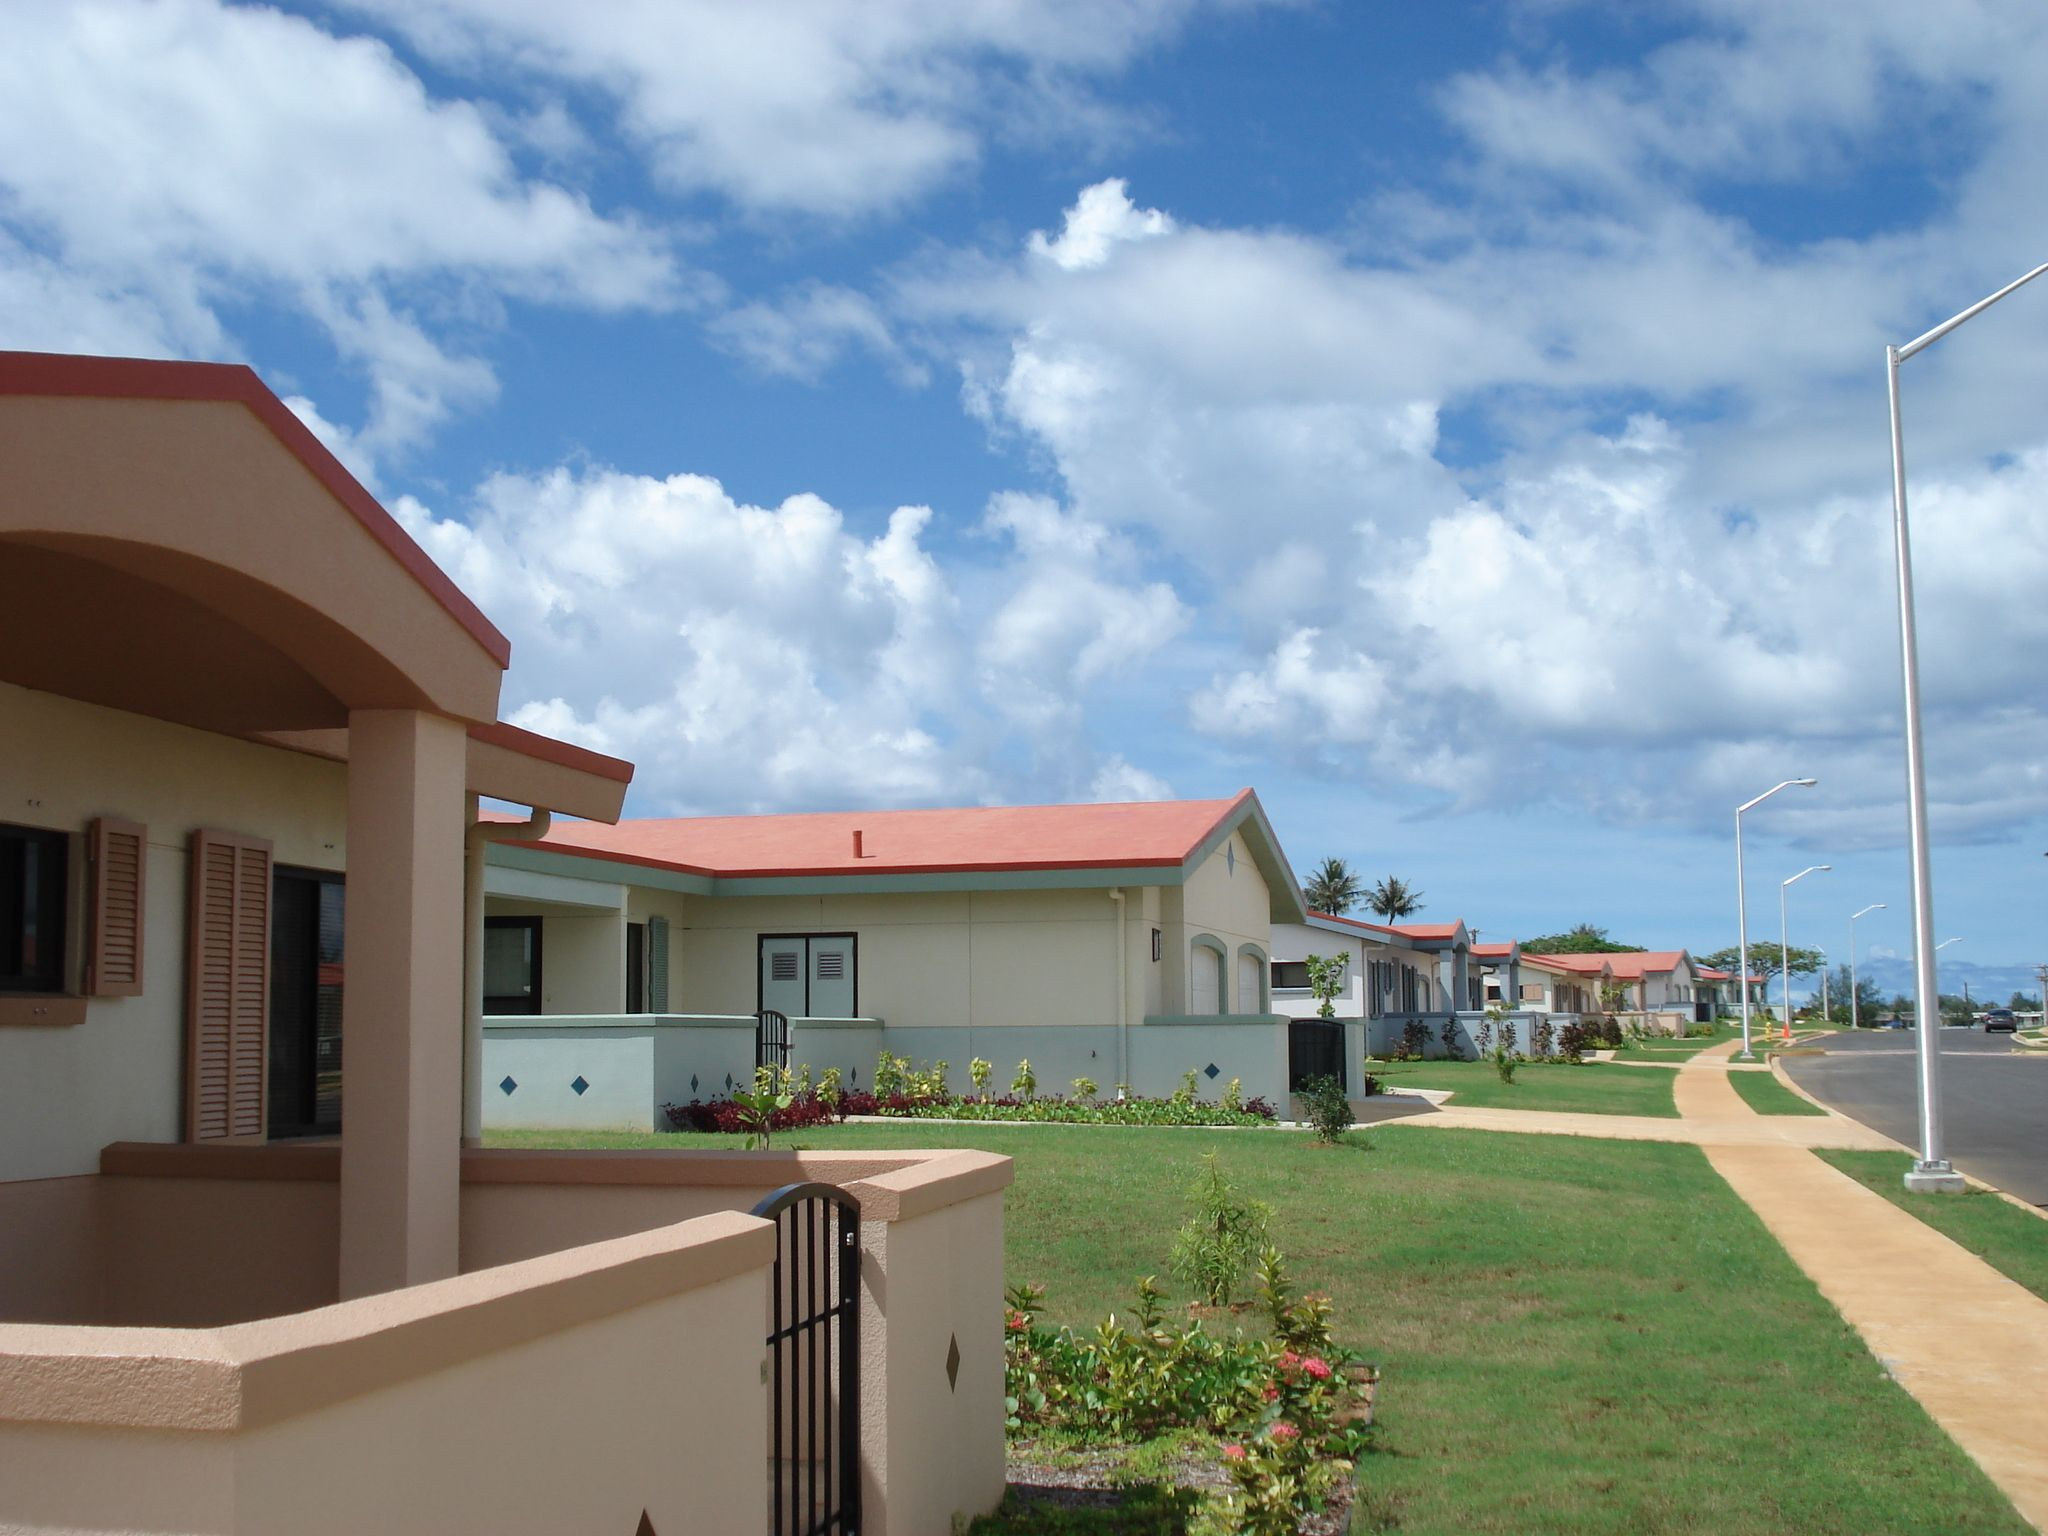 North Tipalo Hsg Guam #2 (9-4-08).jpg